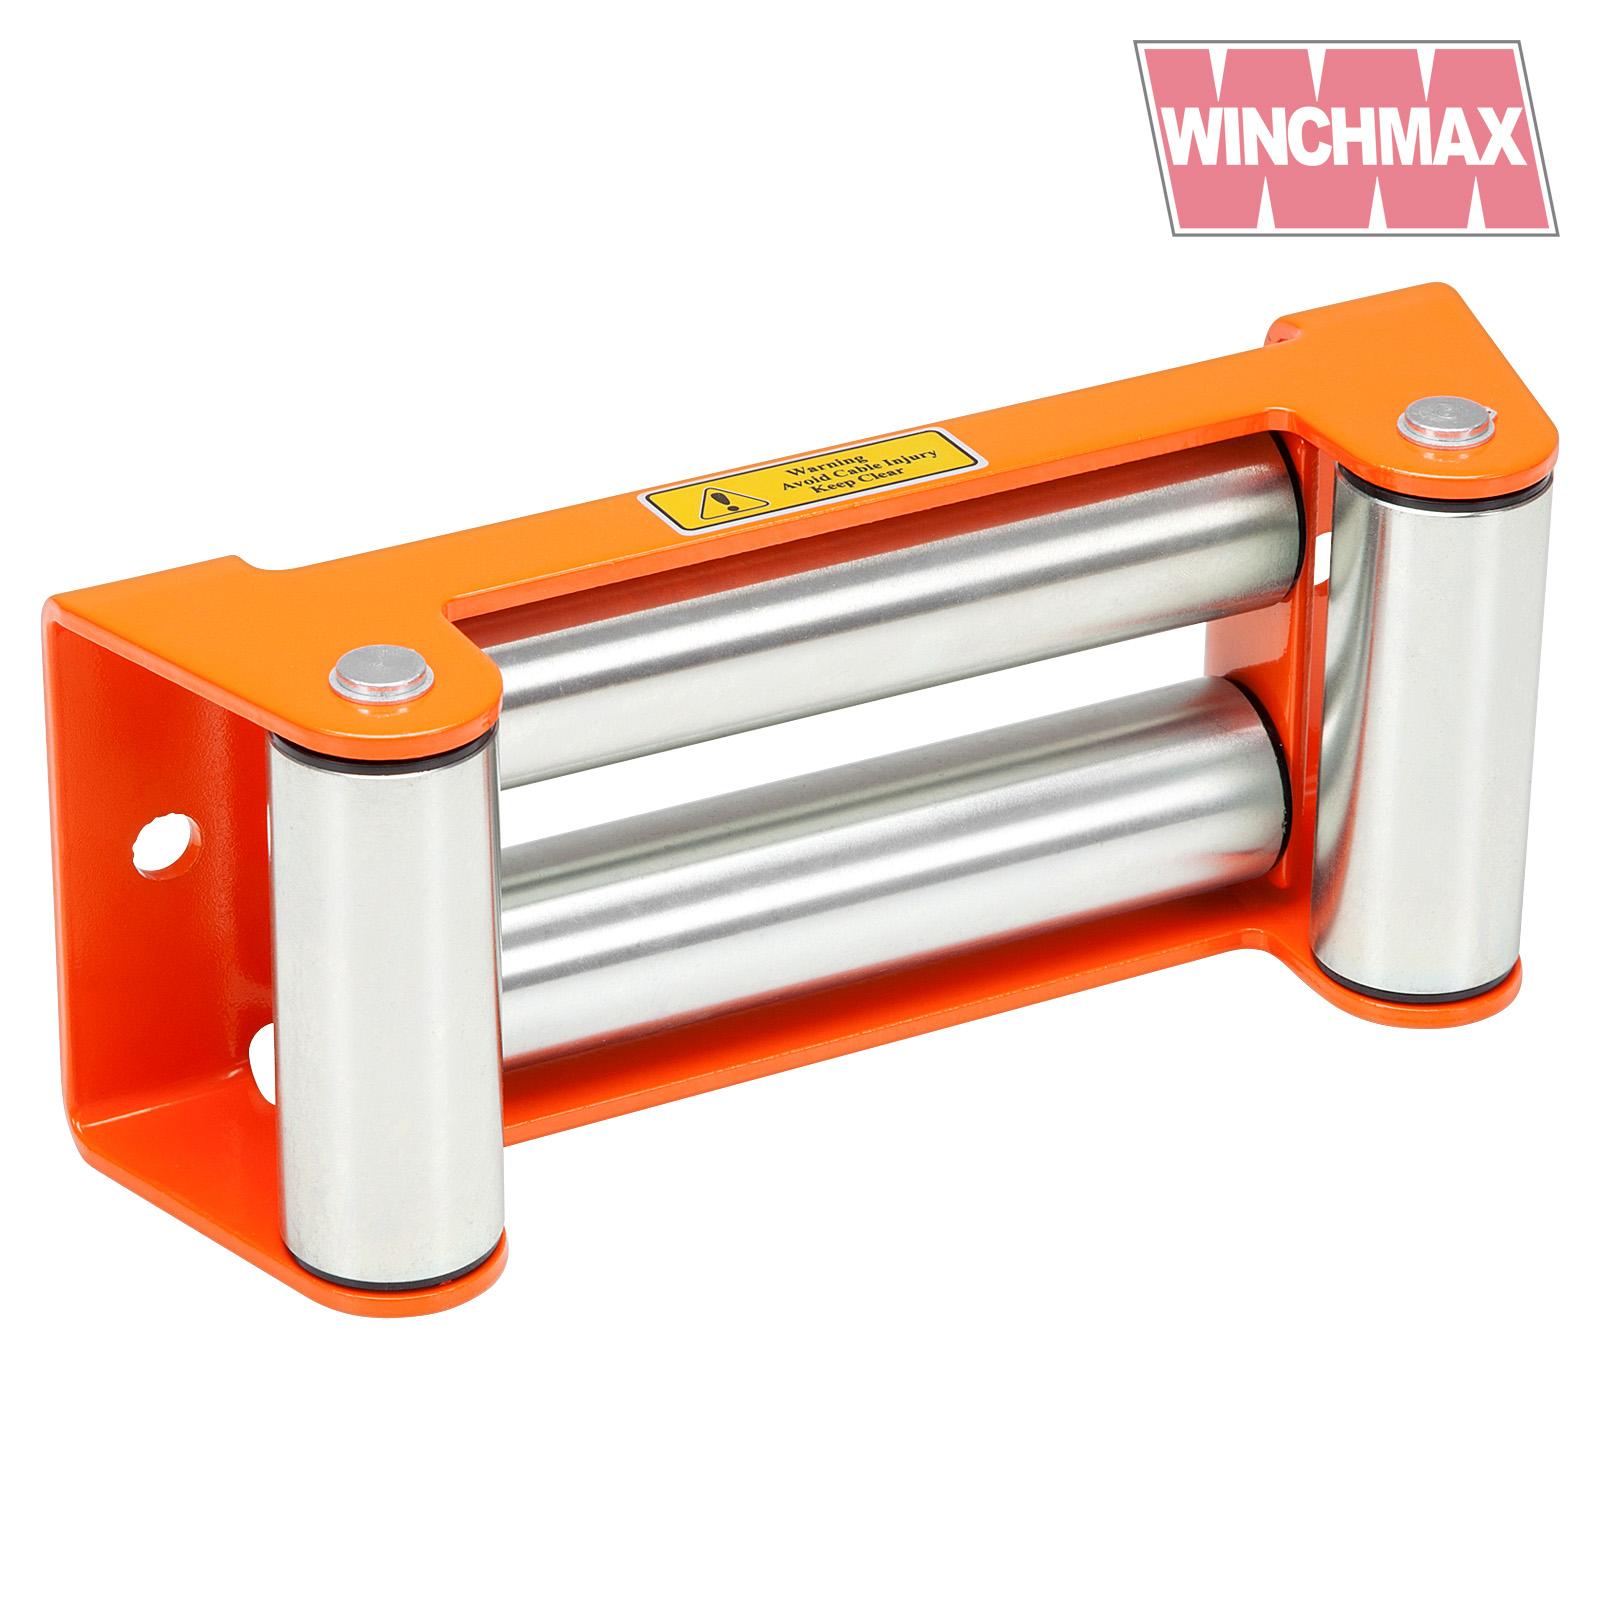 Wmrfo winchmax 313